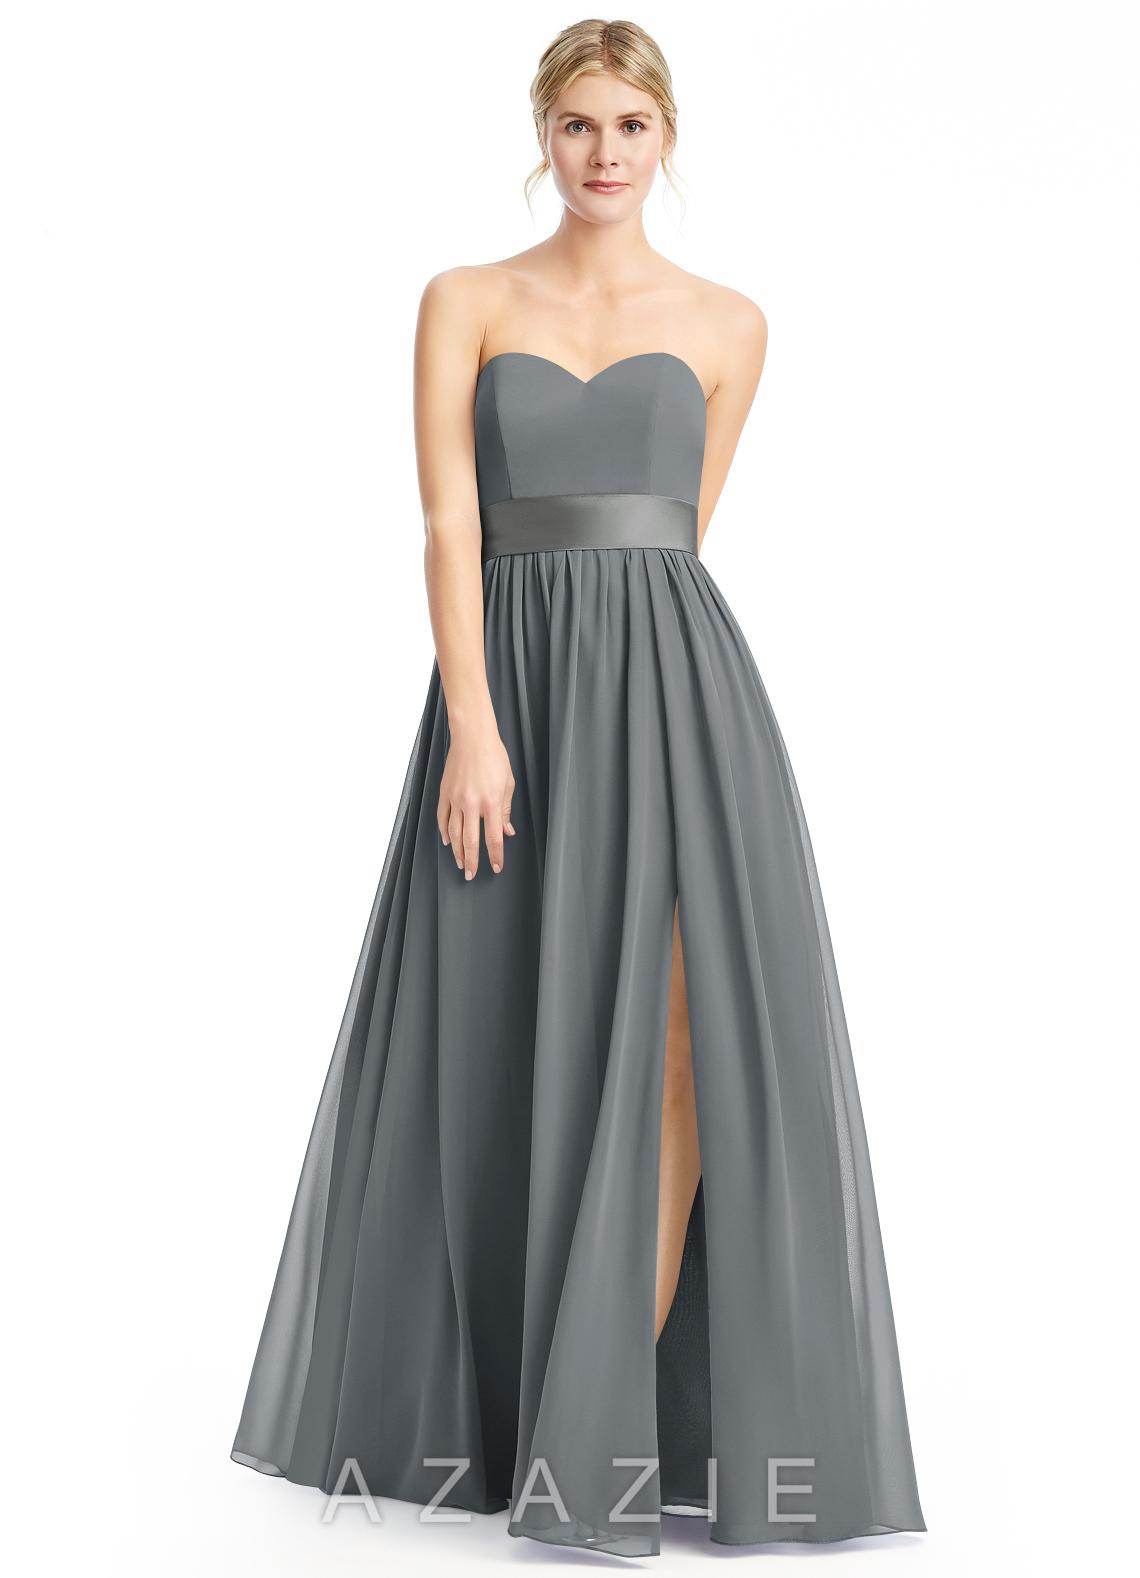 Azazie Fiona Bridesmaid Dress Azazie